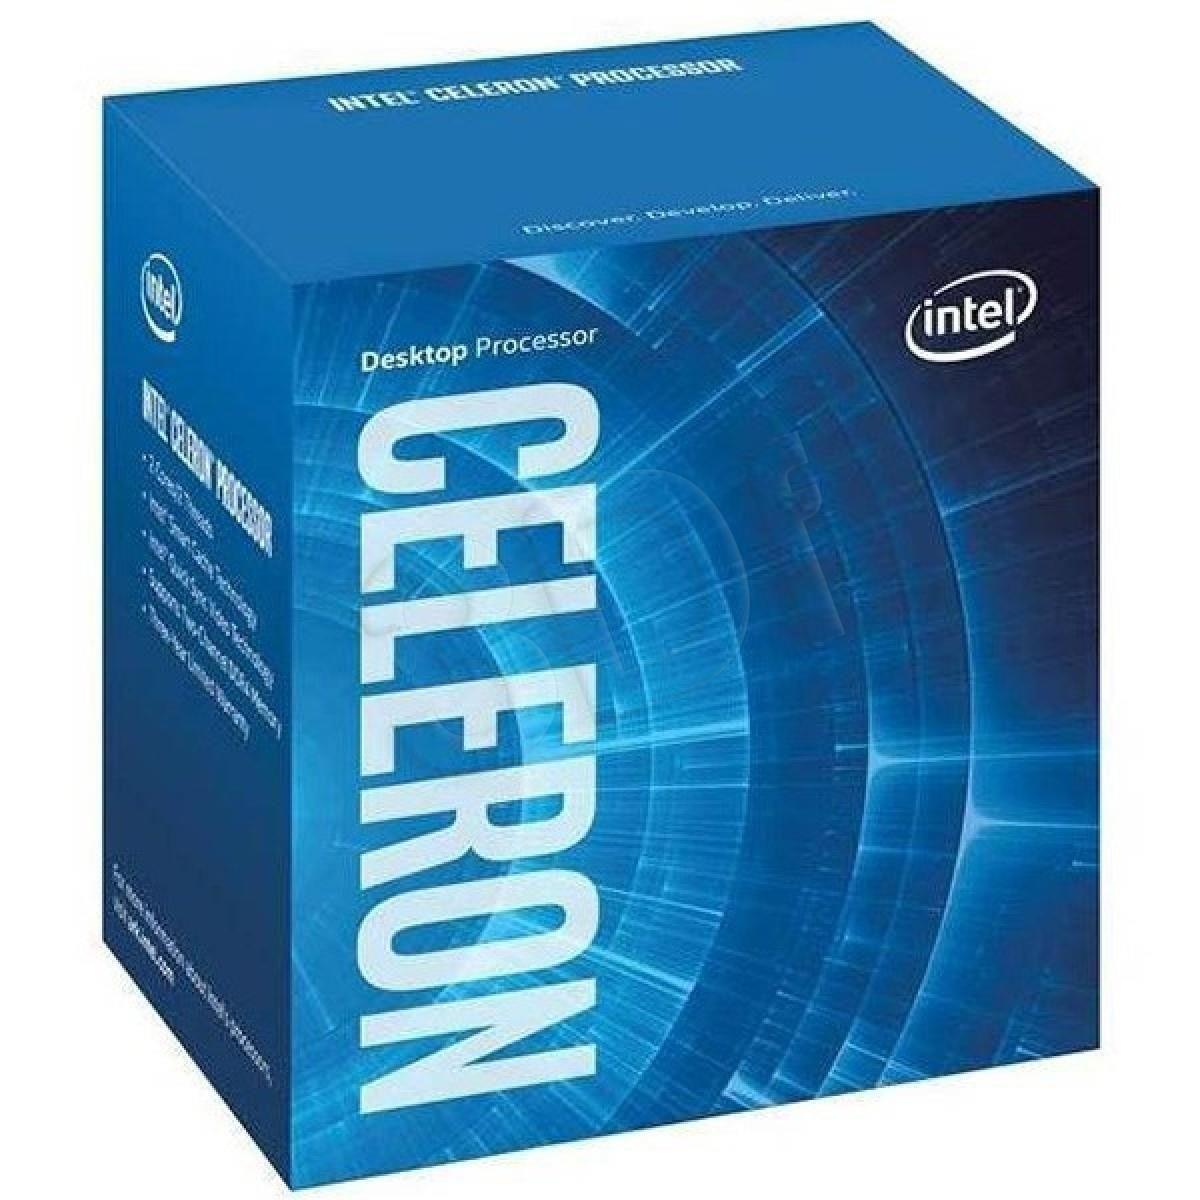 Intel Procesor CPU/Celeron G3900 2.80GHz 2M LGA1151 BOX